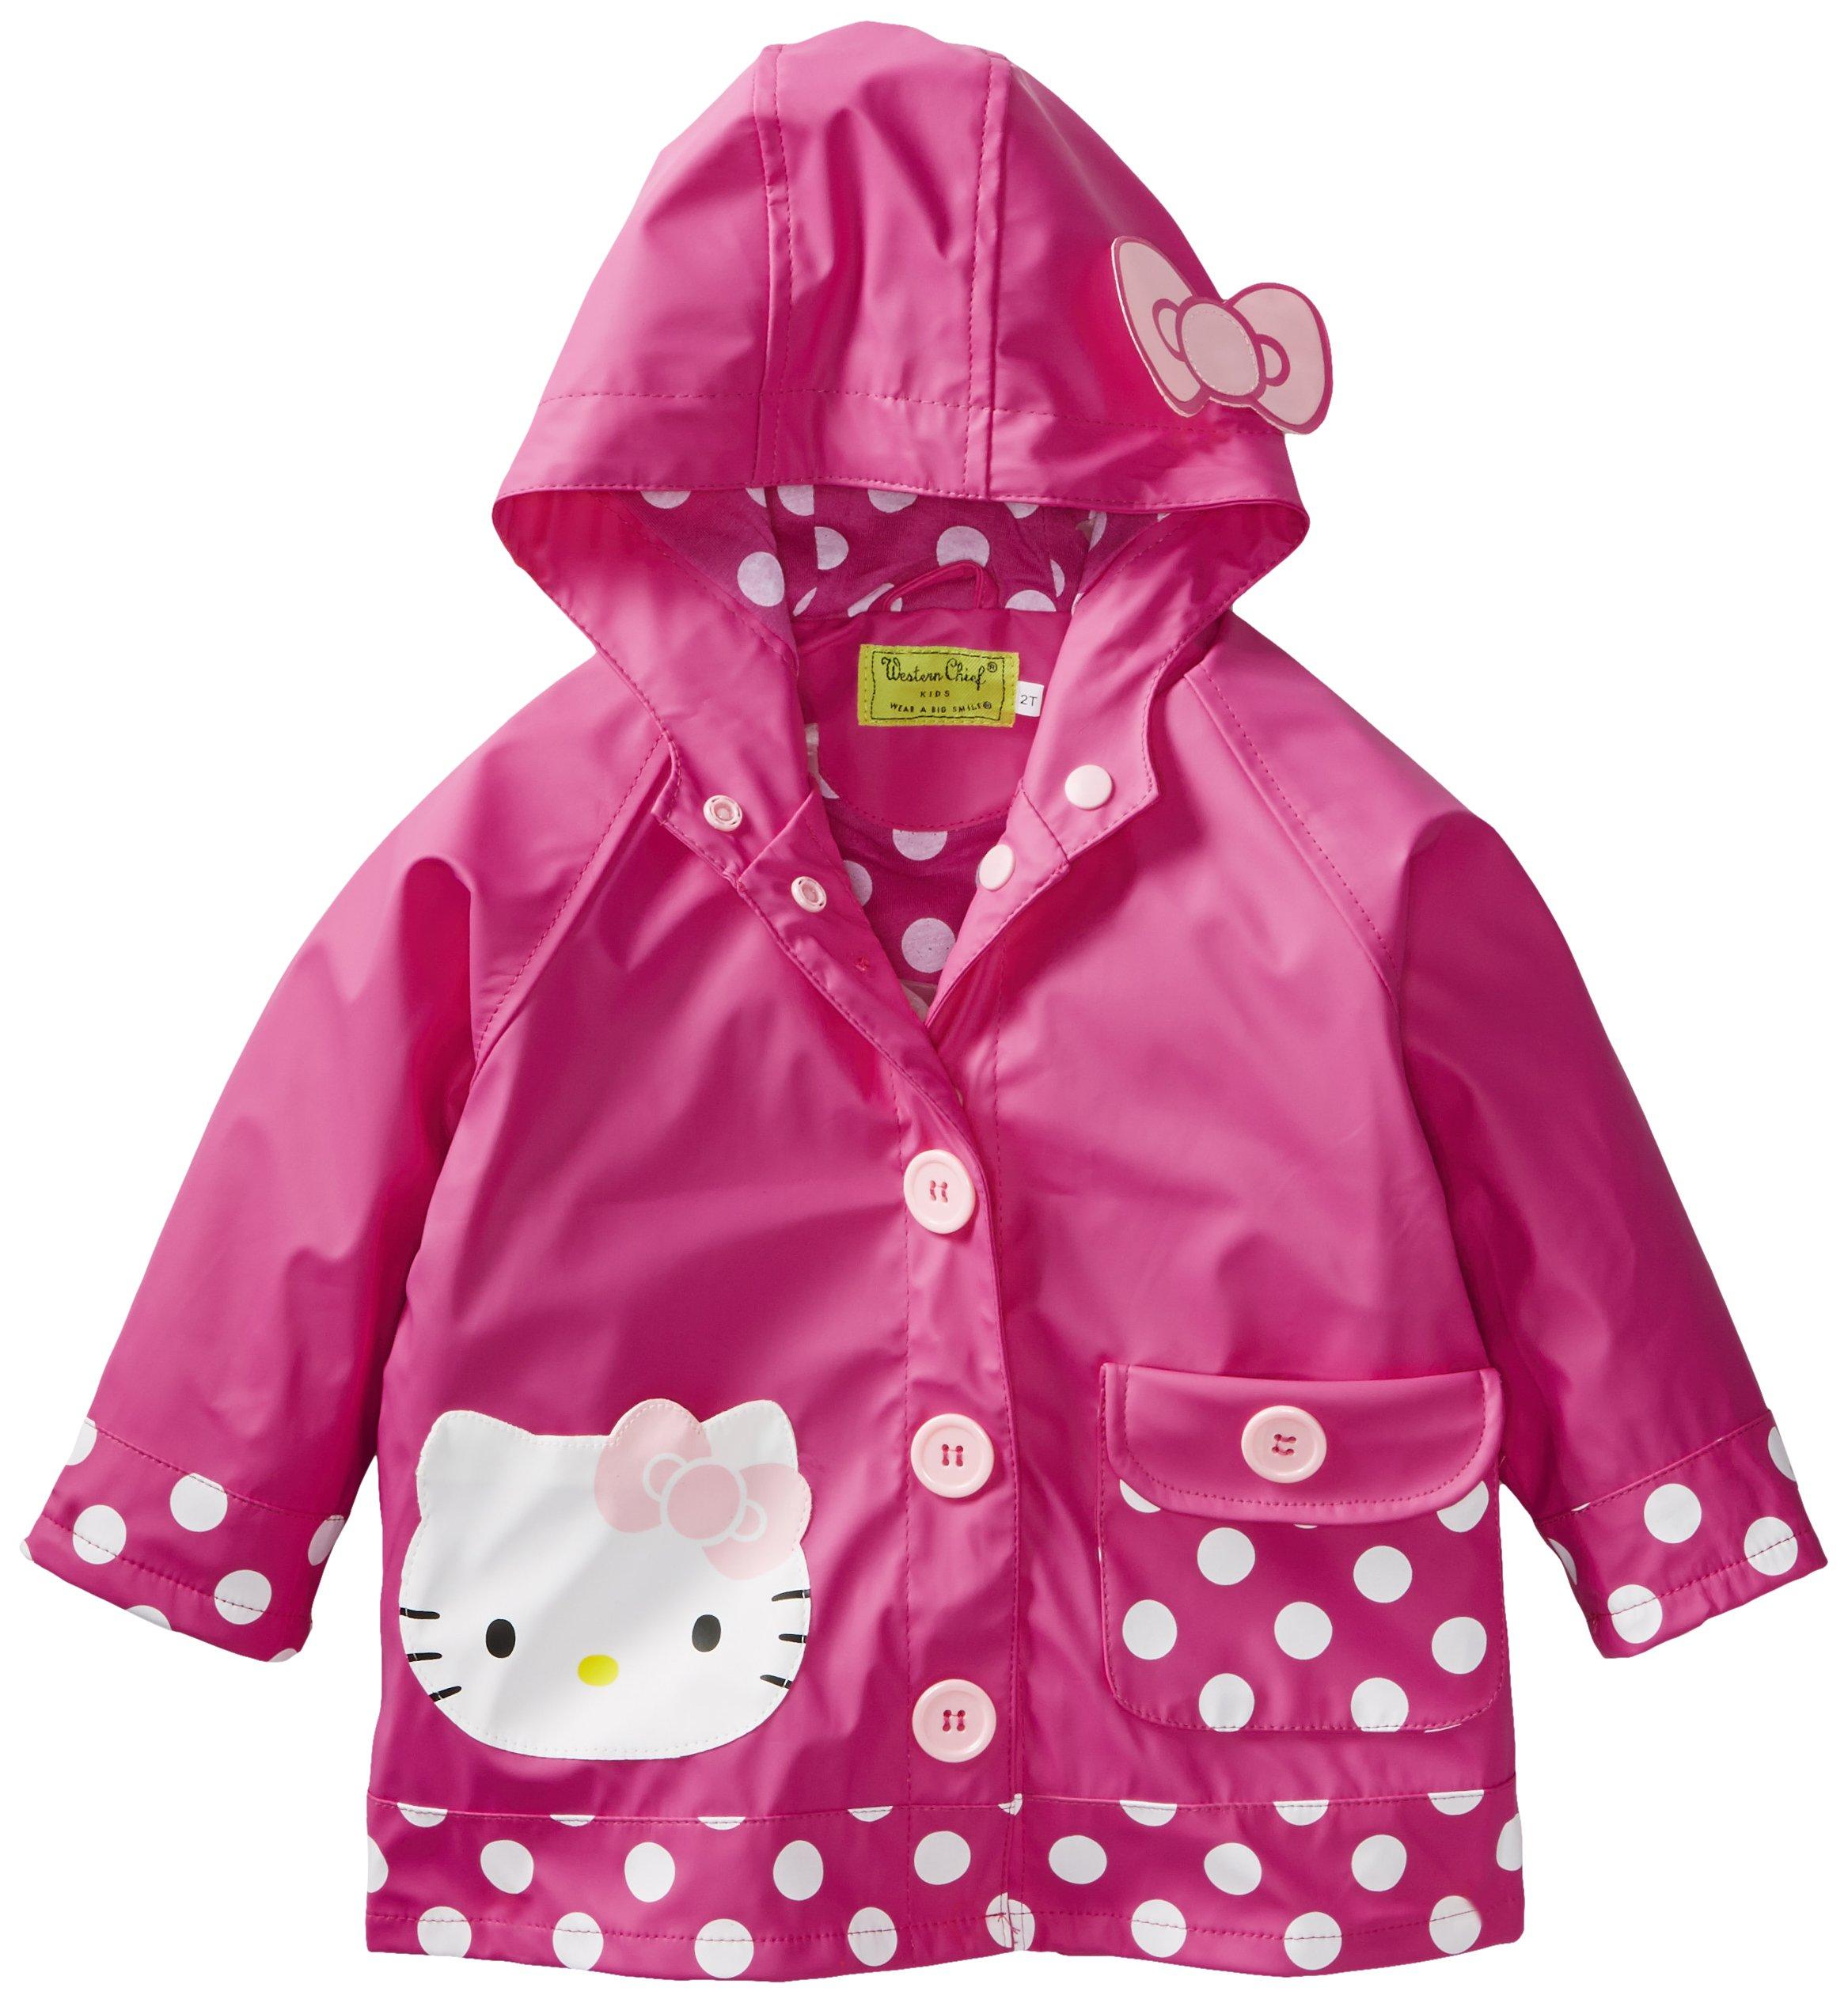 Western Chief Girls Hello Kitty Lined Rain Jacket, Hello Kitty Cutie Dot, 4T by Western Chief